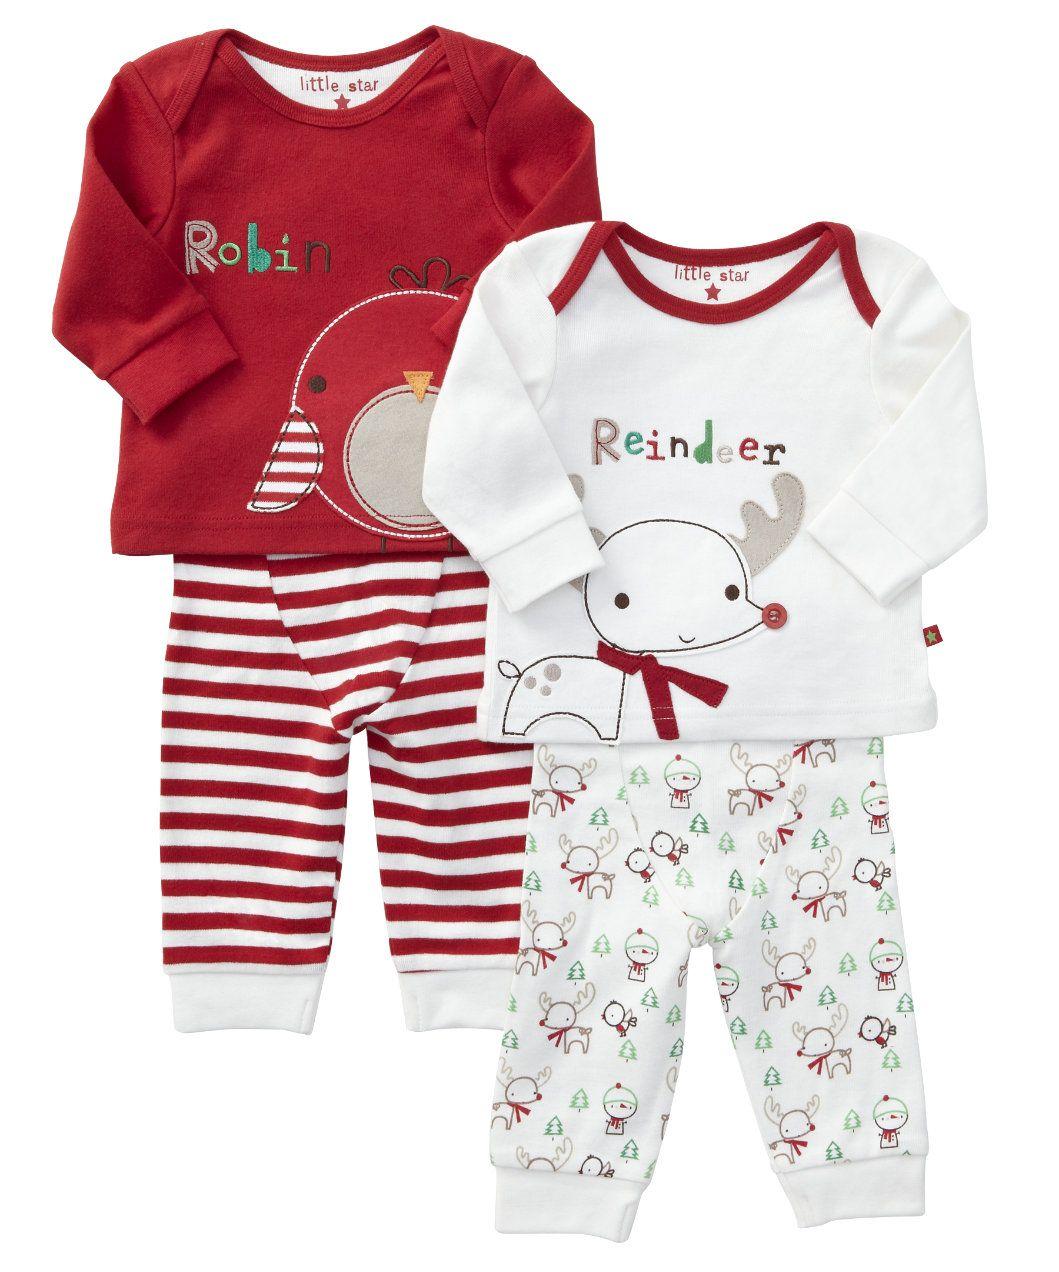 Mothercare Unisex Christmas Pyjamas Set – 2 pack - pyjamas - Mothercare eb12235ee